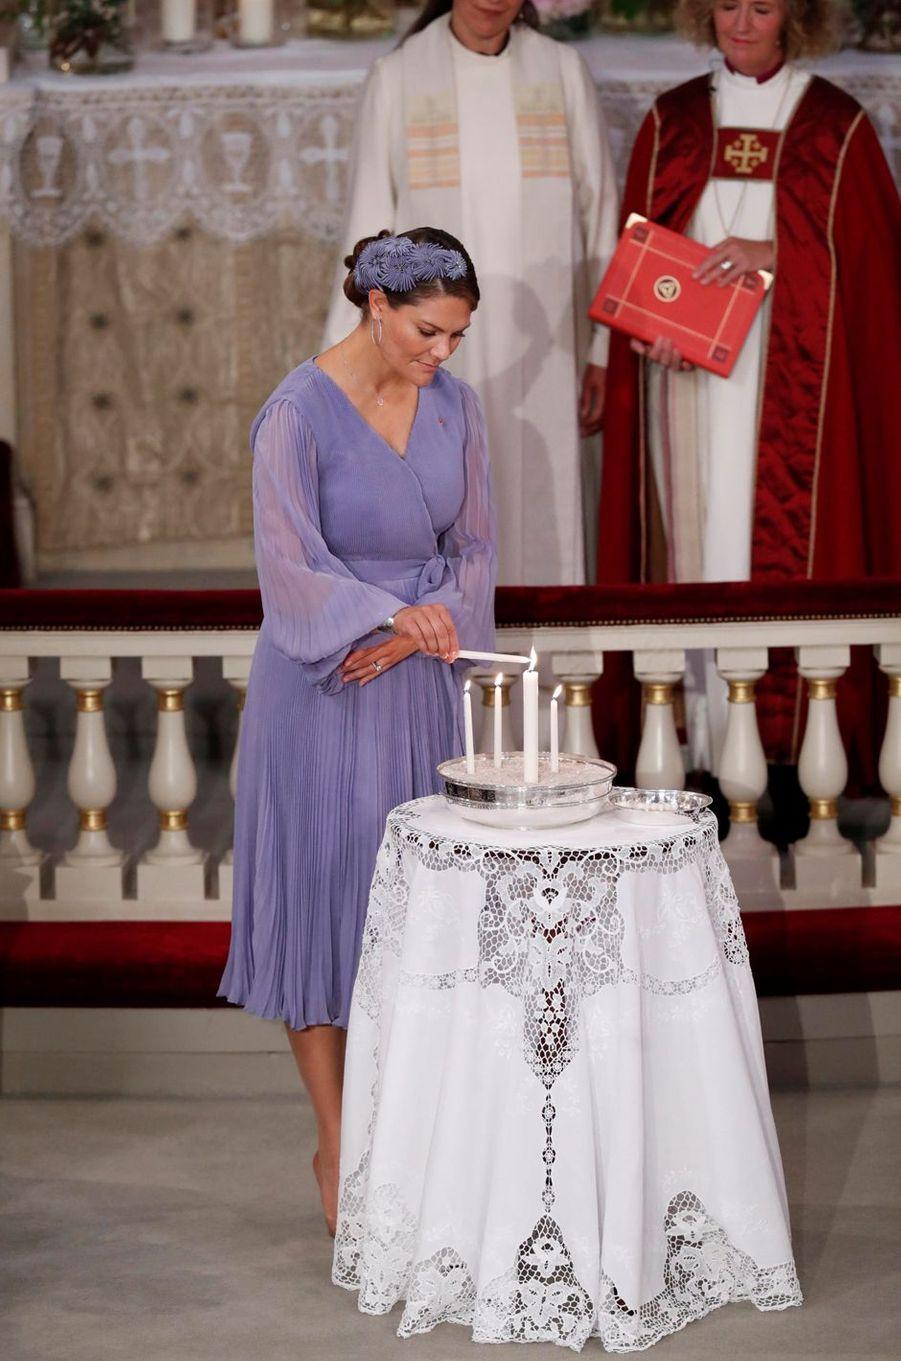 La princesse Victoria de Suède lors de la confirmation de sa filleule la princesse Ingrid Alexandra de Norvège, à Oslo le 31 août 2019